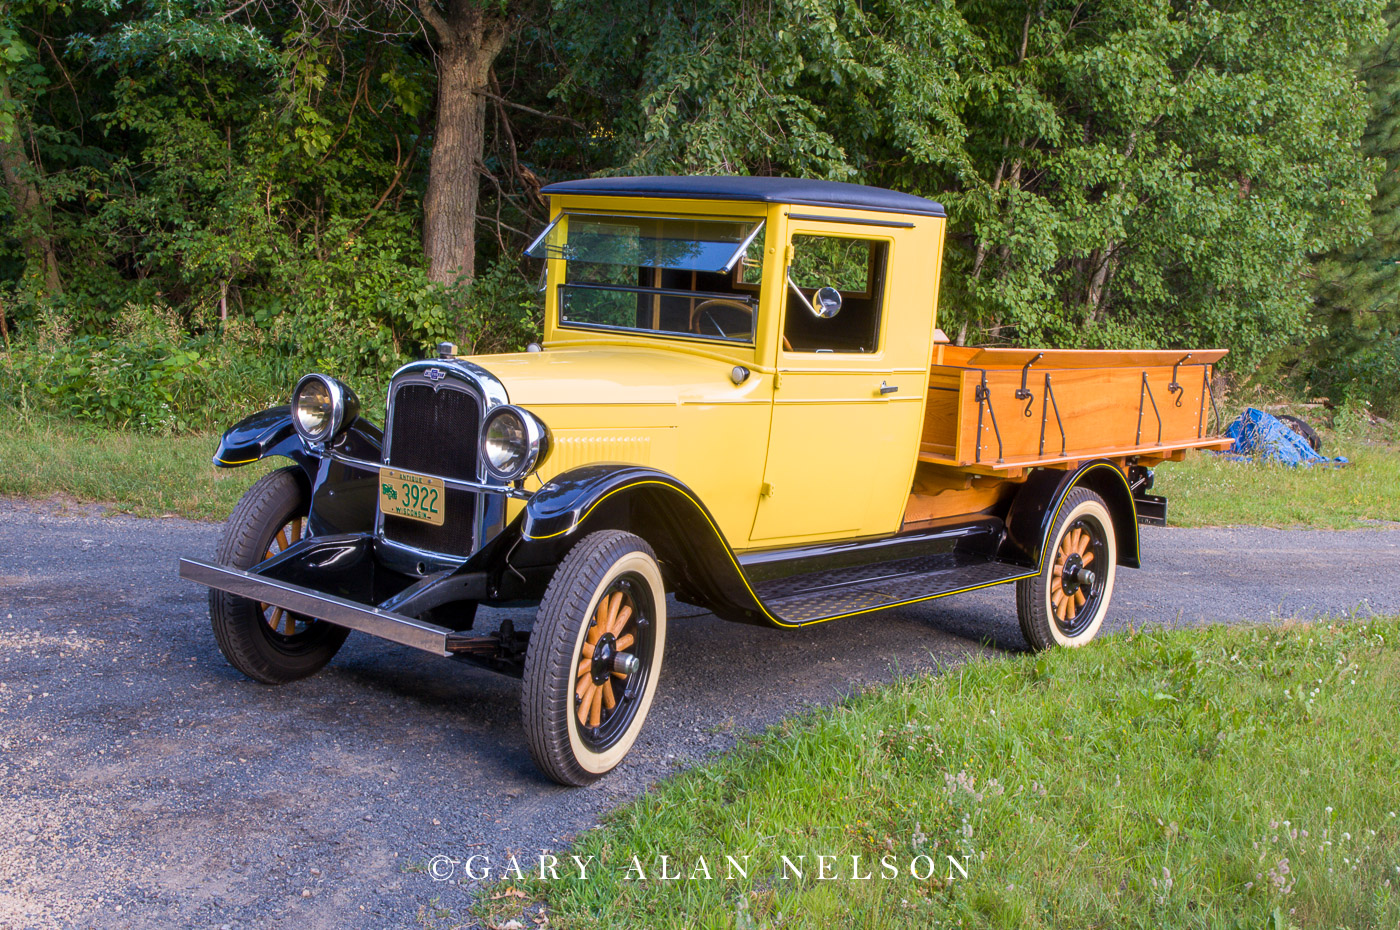 VT-07-33-CH 1928 Chevrolet One-ton Truck